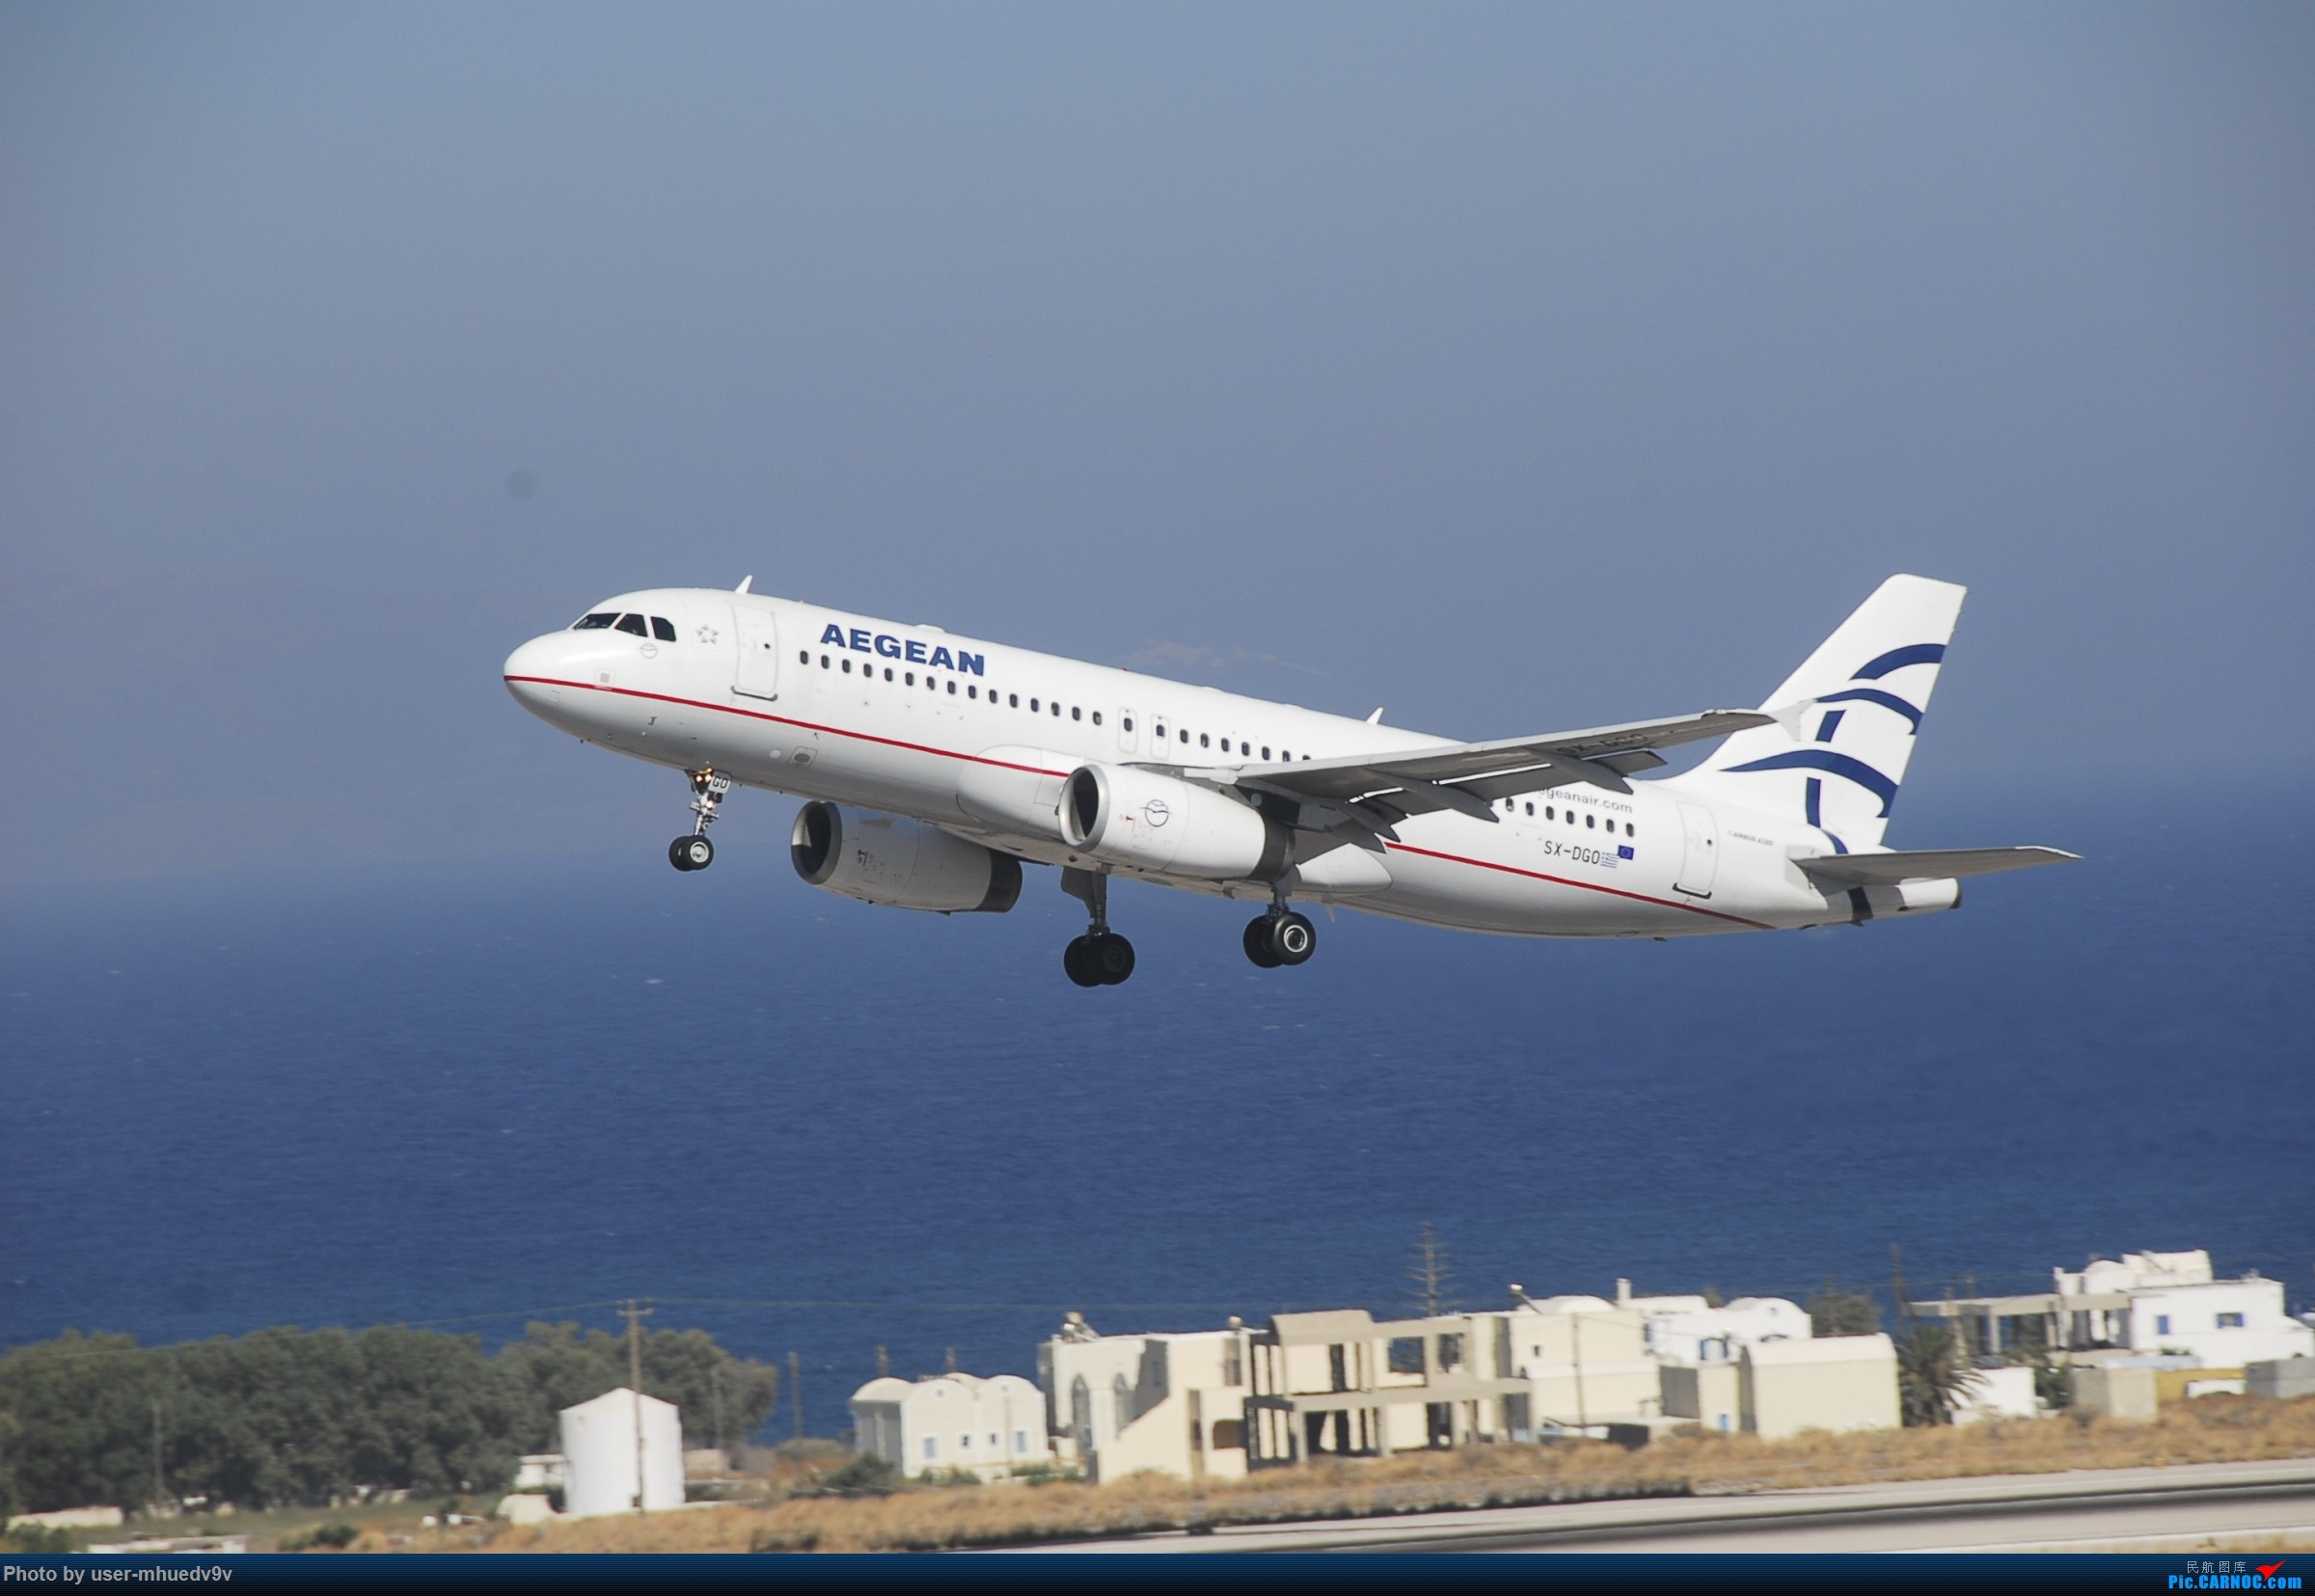 Re:[原创]暑假旅拍(旅途中拍机。。。) AIRBUS A320-200 SX-DGO 希腊圣托里尼机场